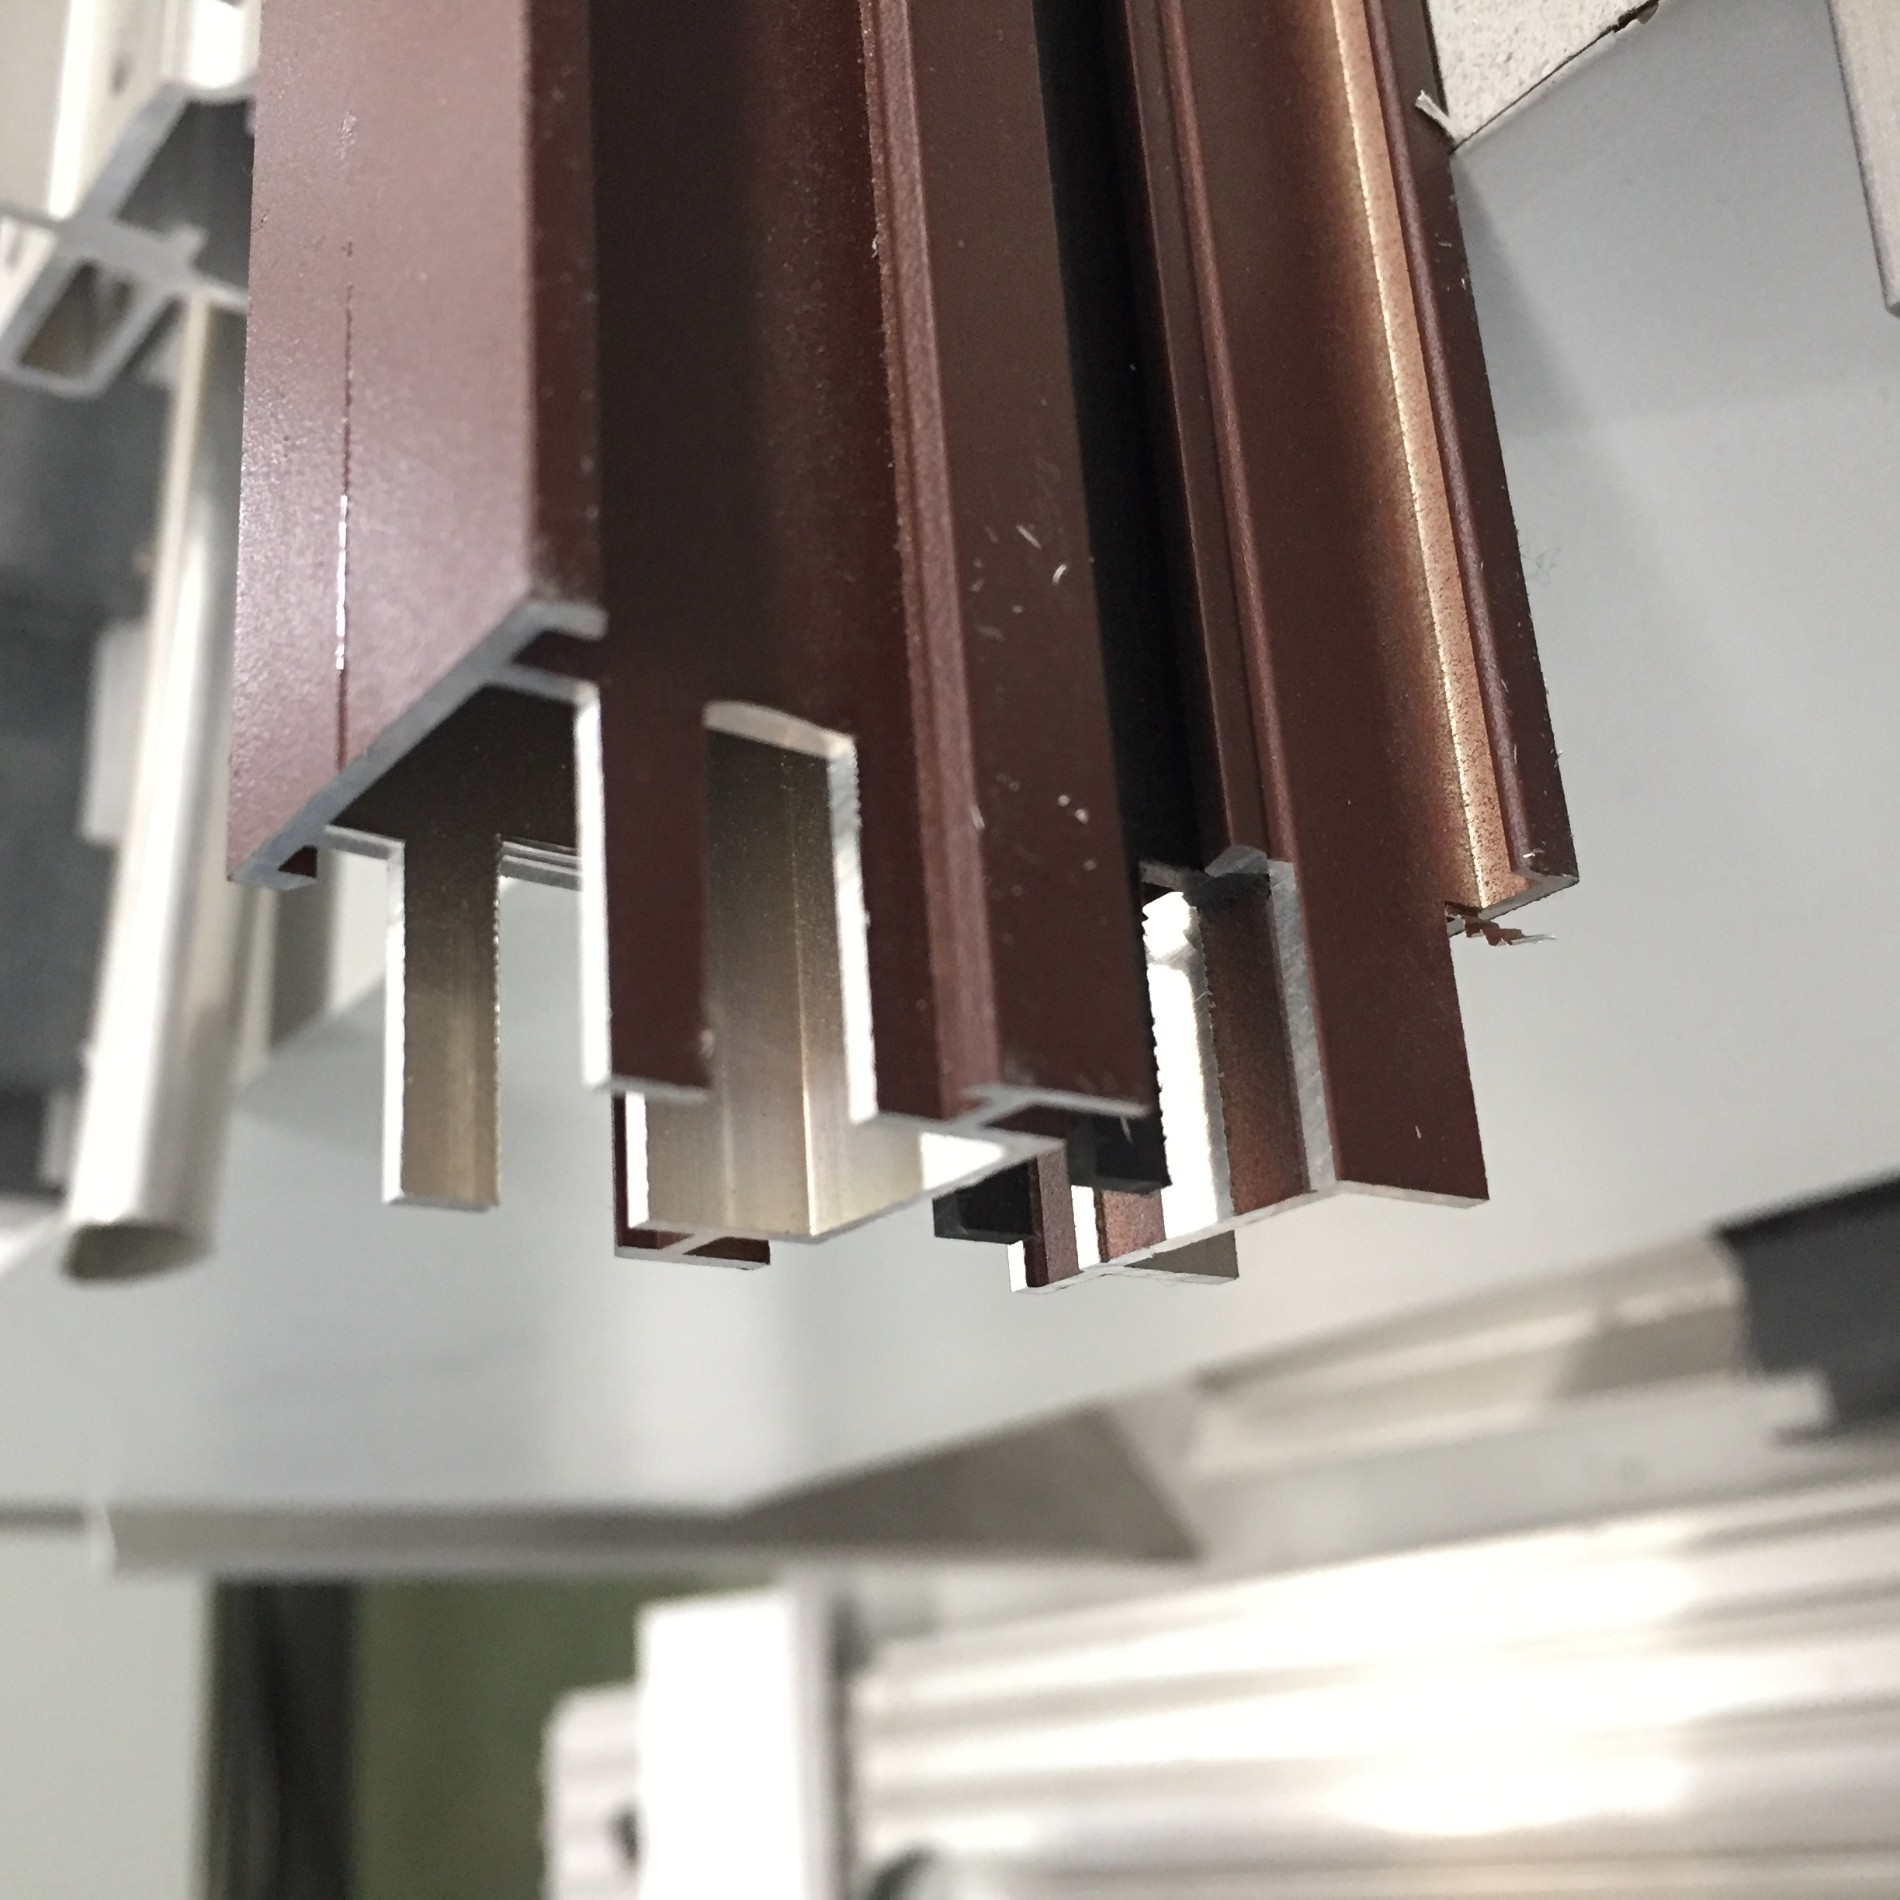 High quality Aluminium Automatic End Milling Machine Quotes,China Aluminium Automatic End Milling Machine Factory,Aluminium Automatic End Milling Machine Purchasing